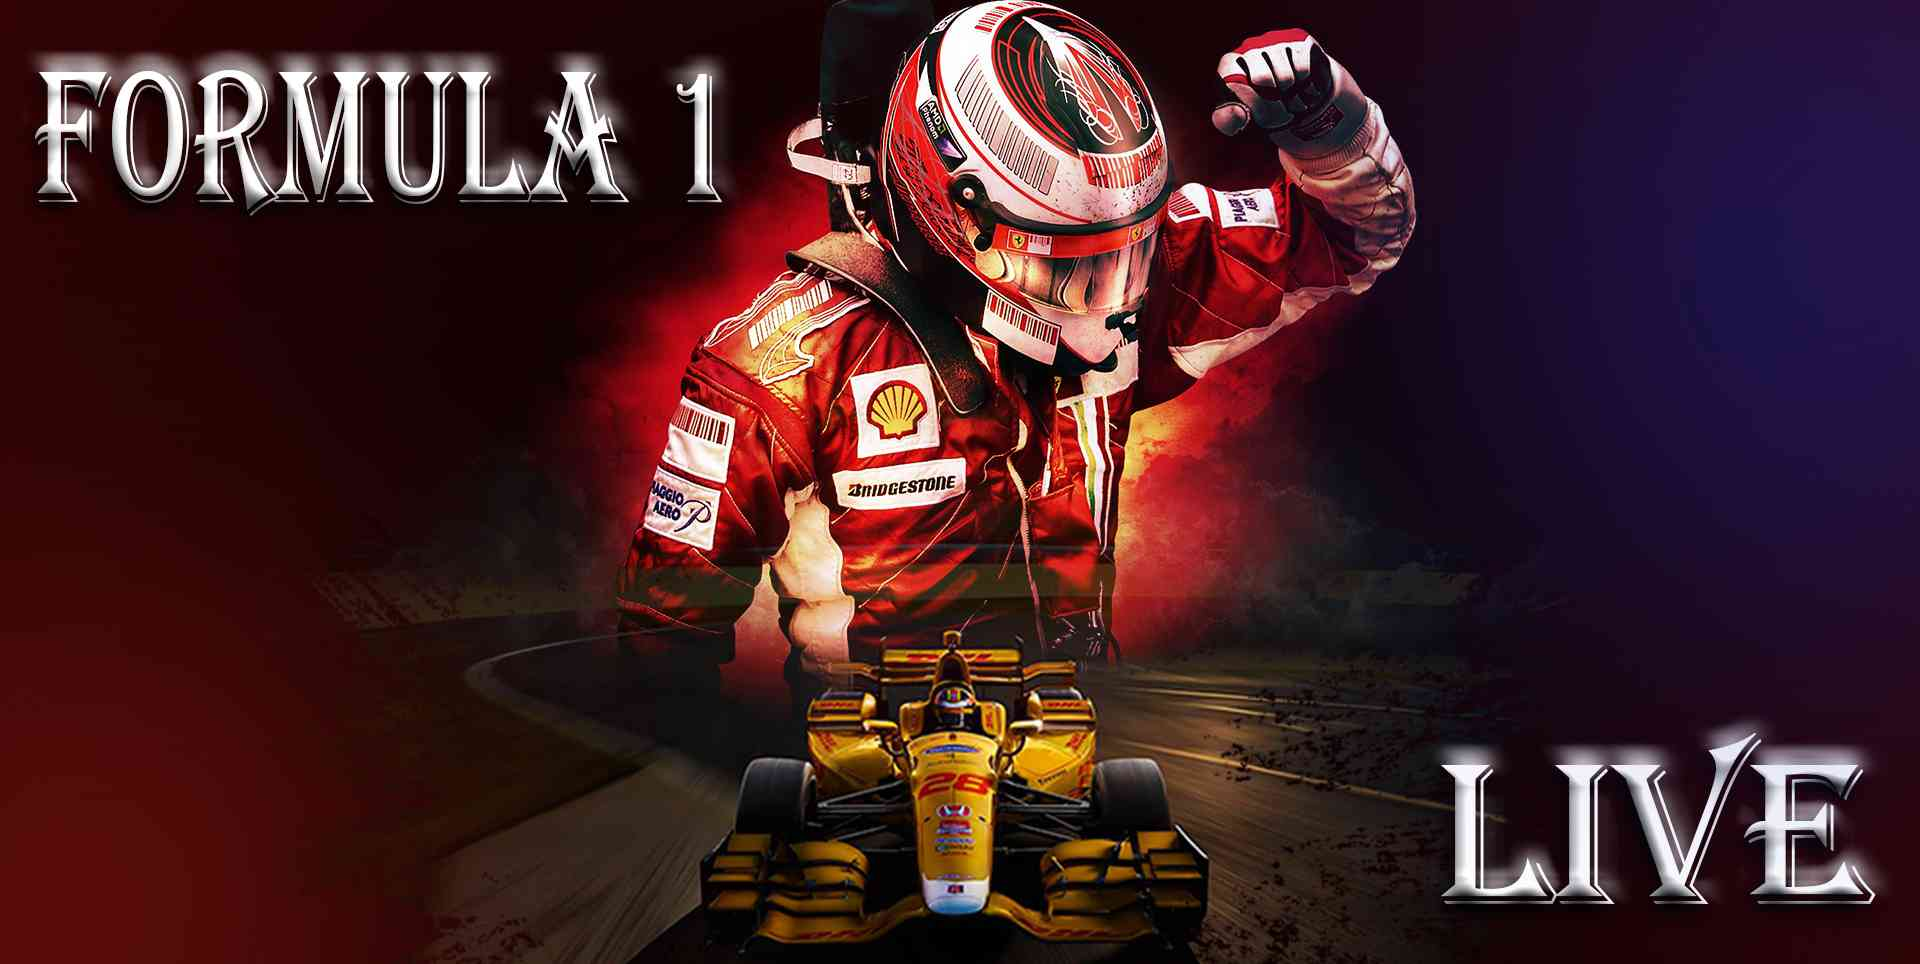 F1 Azerbaijan 2016 Live